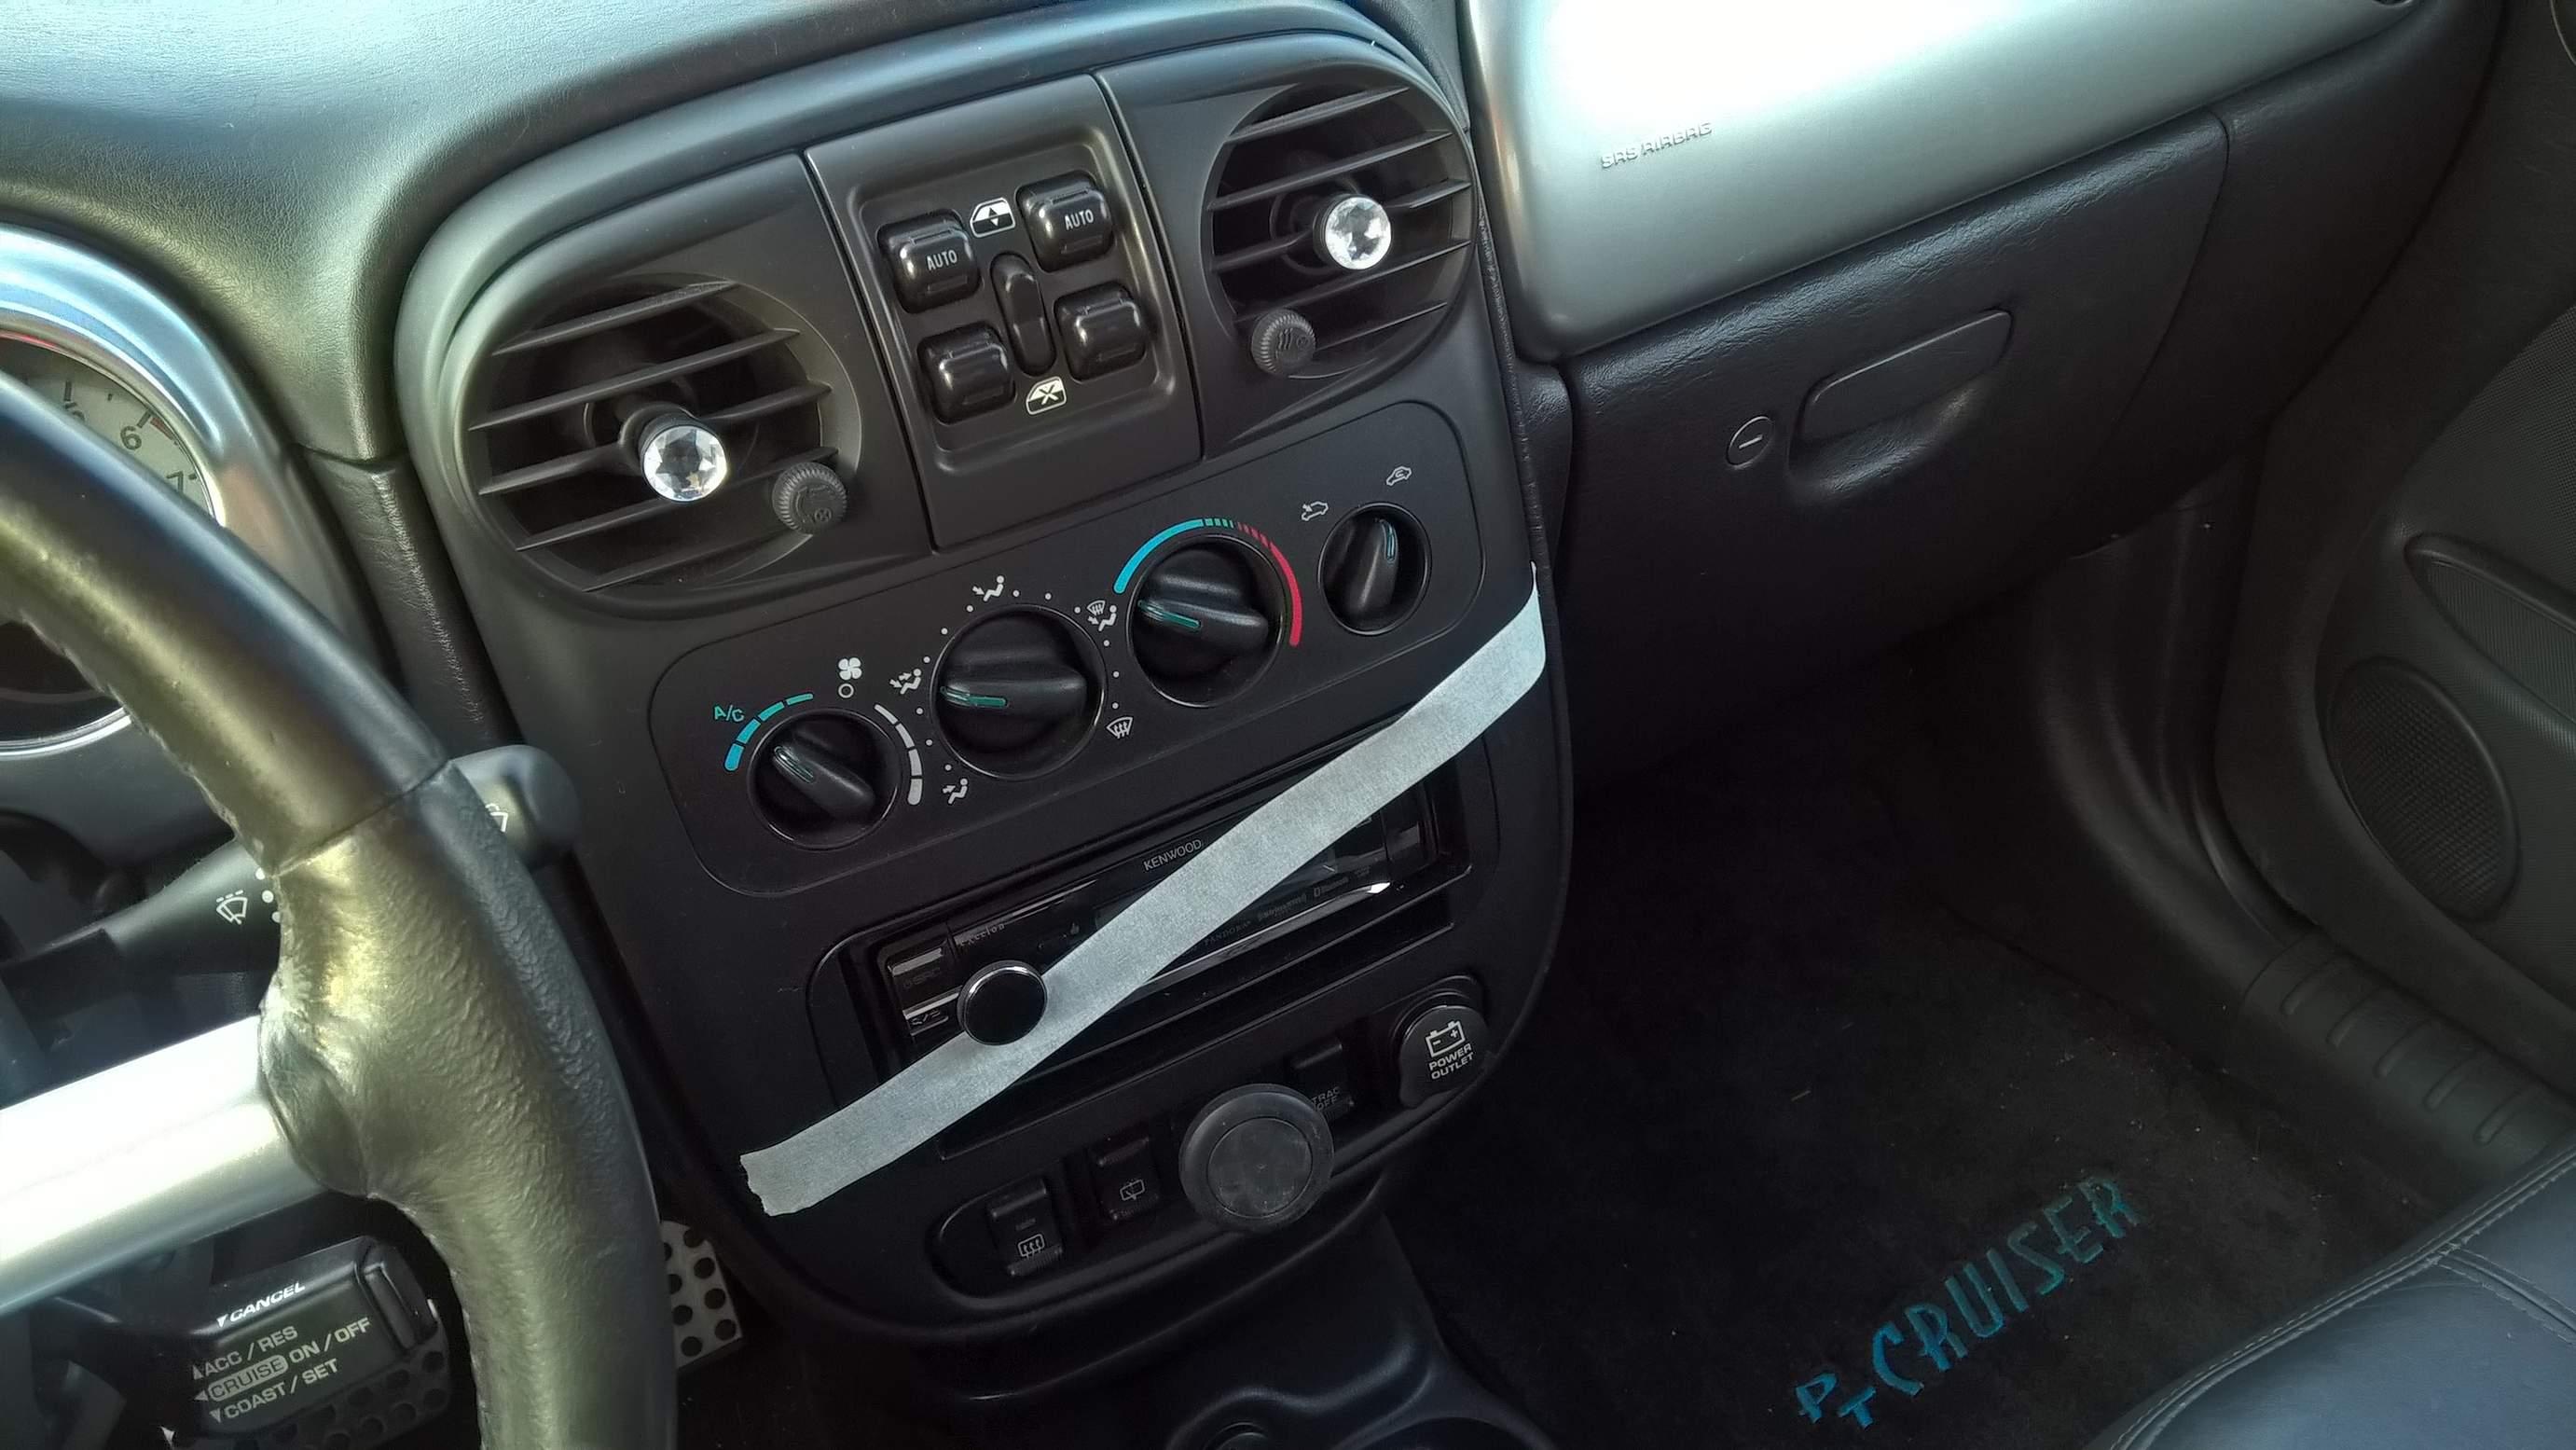 PT Cruiser interior, masking tape over radio